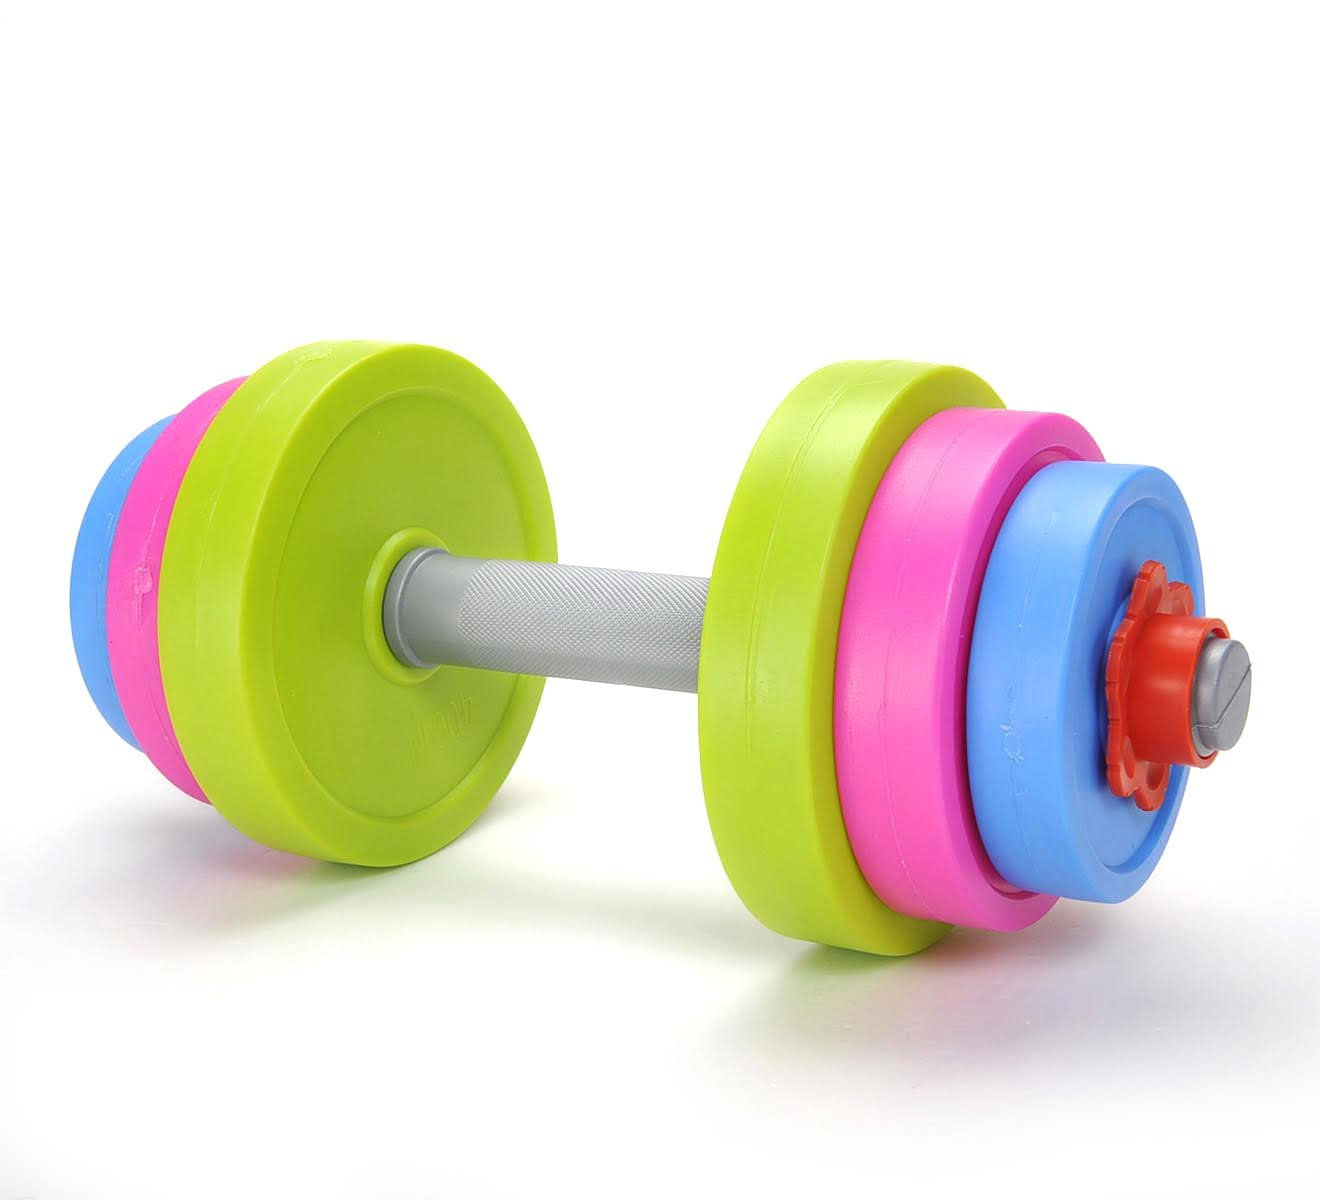 CHIMAERA Adjustable Dumbbell Toy Set for Kids